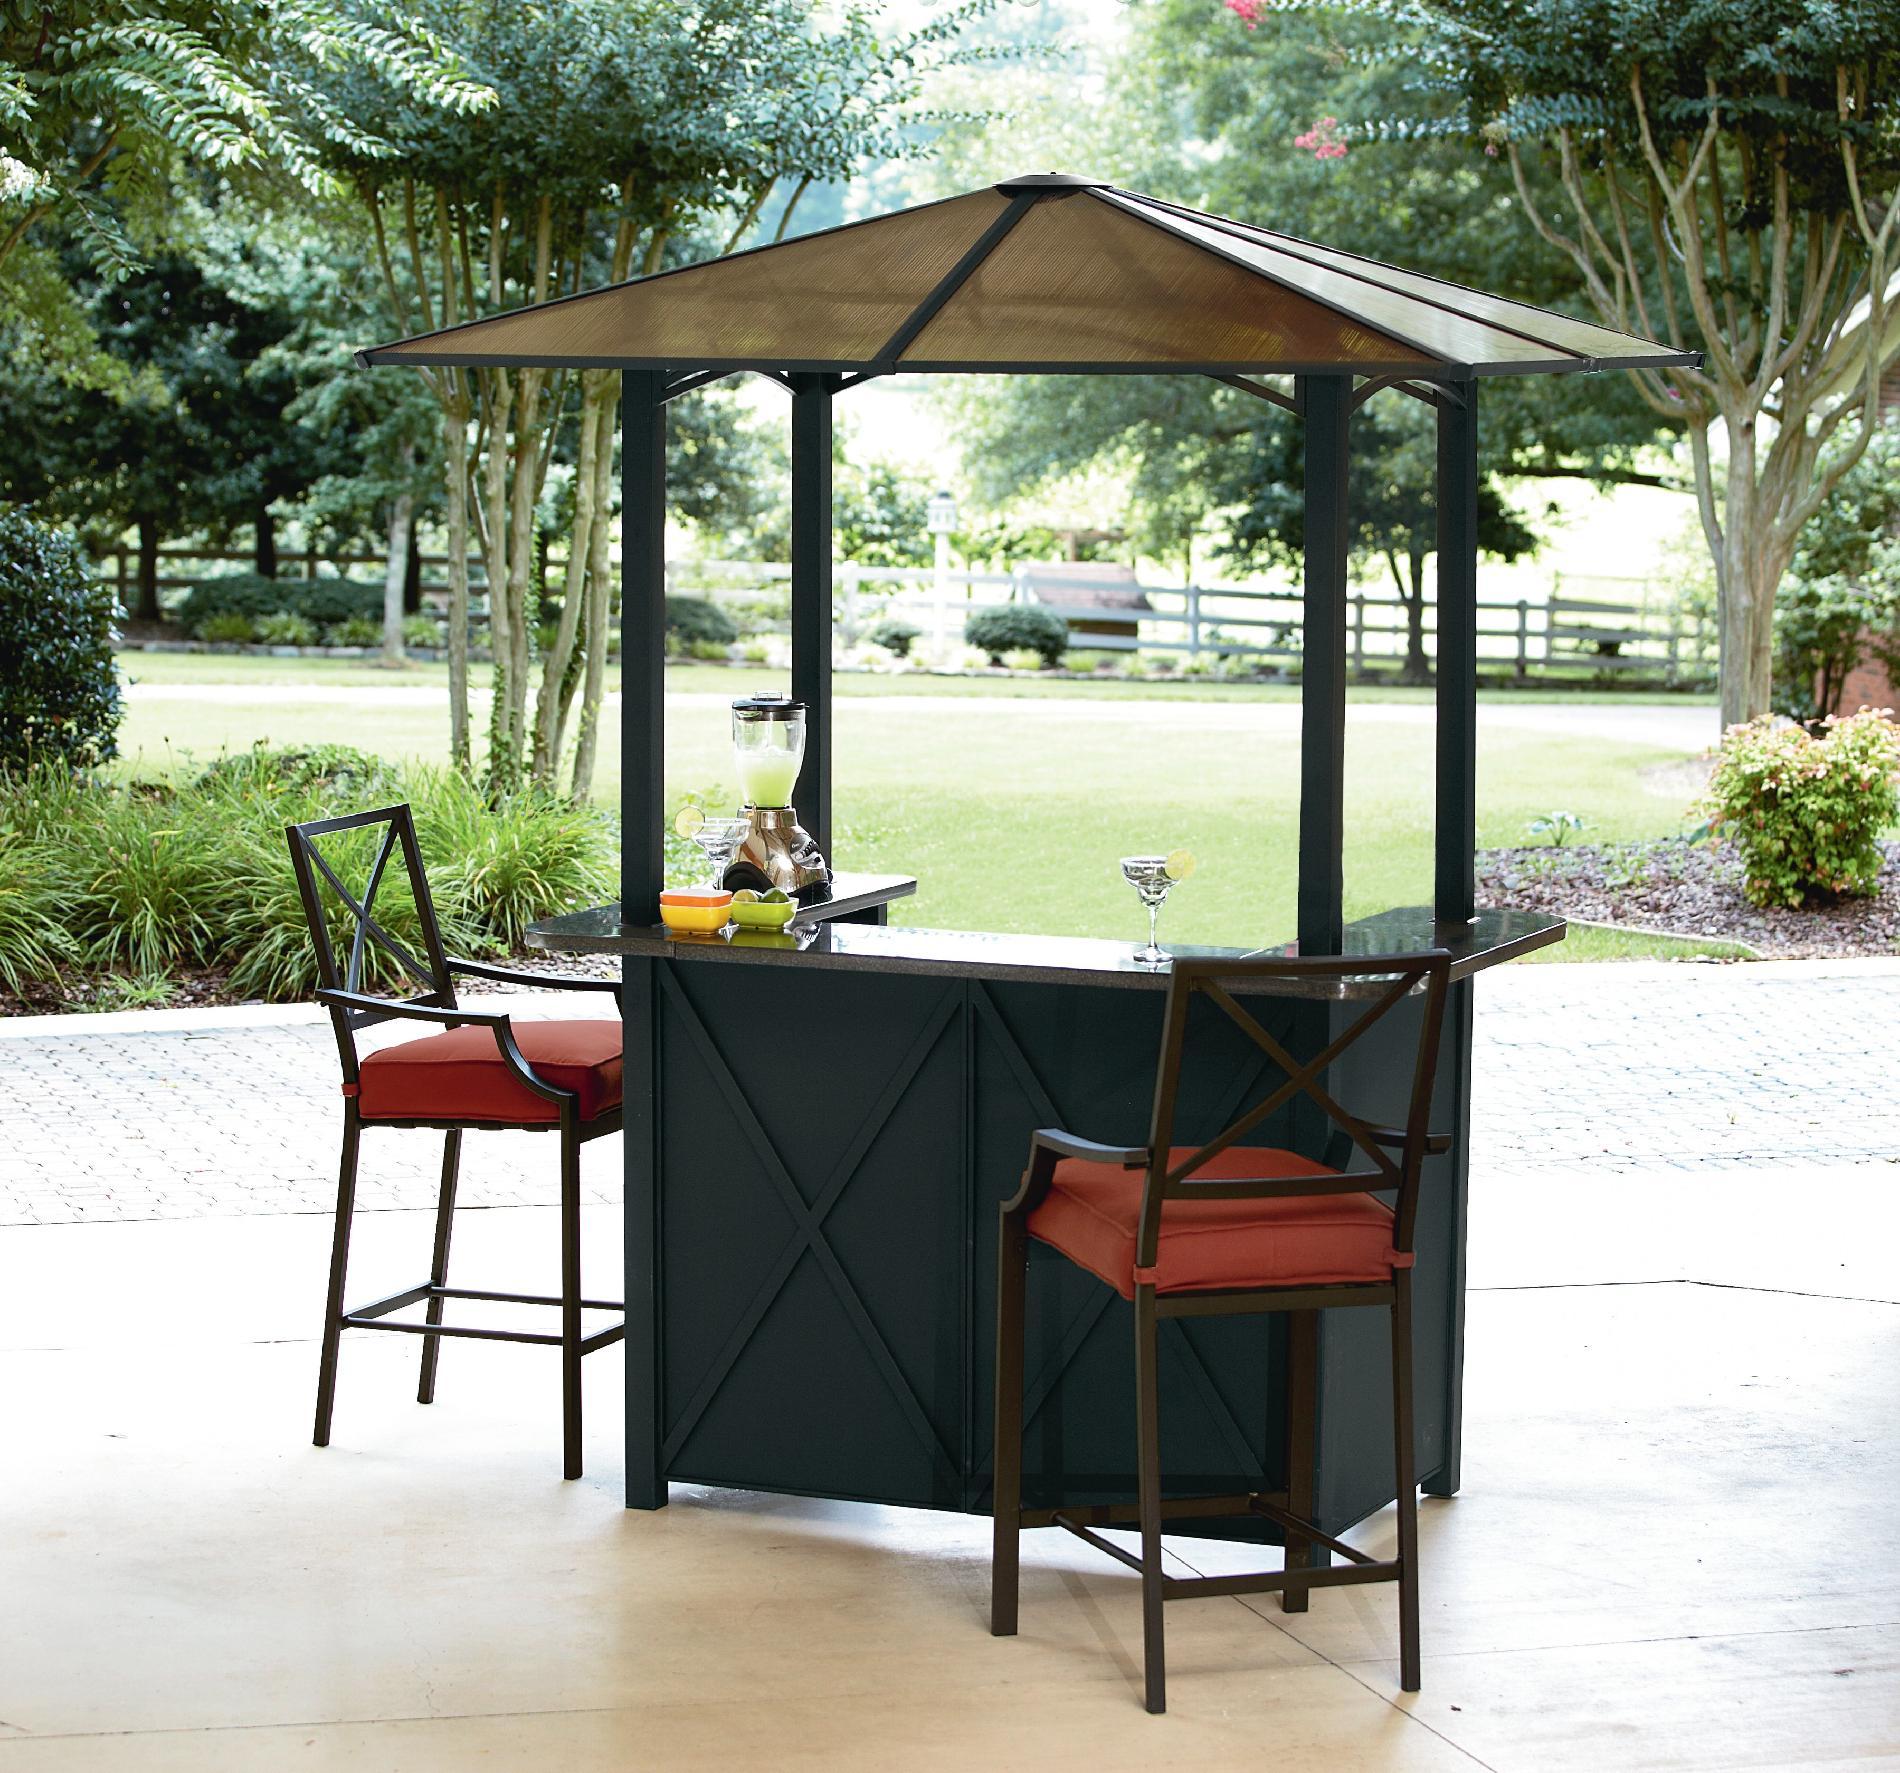 From The Desk of ElleDeeEsse: Outdoor Bar Ideas on Portable Backyard Bar id=34786